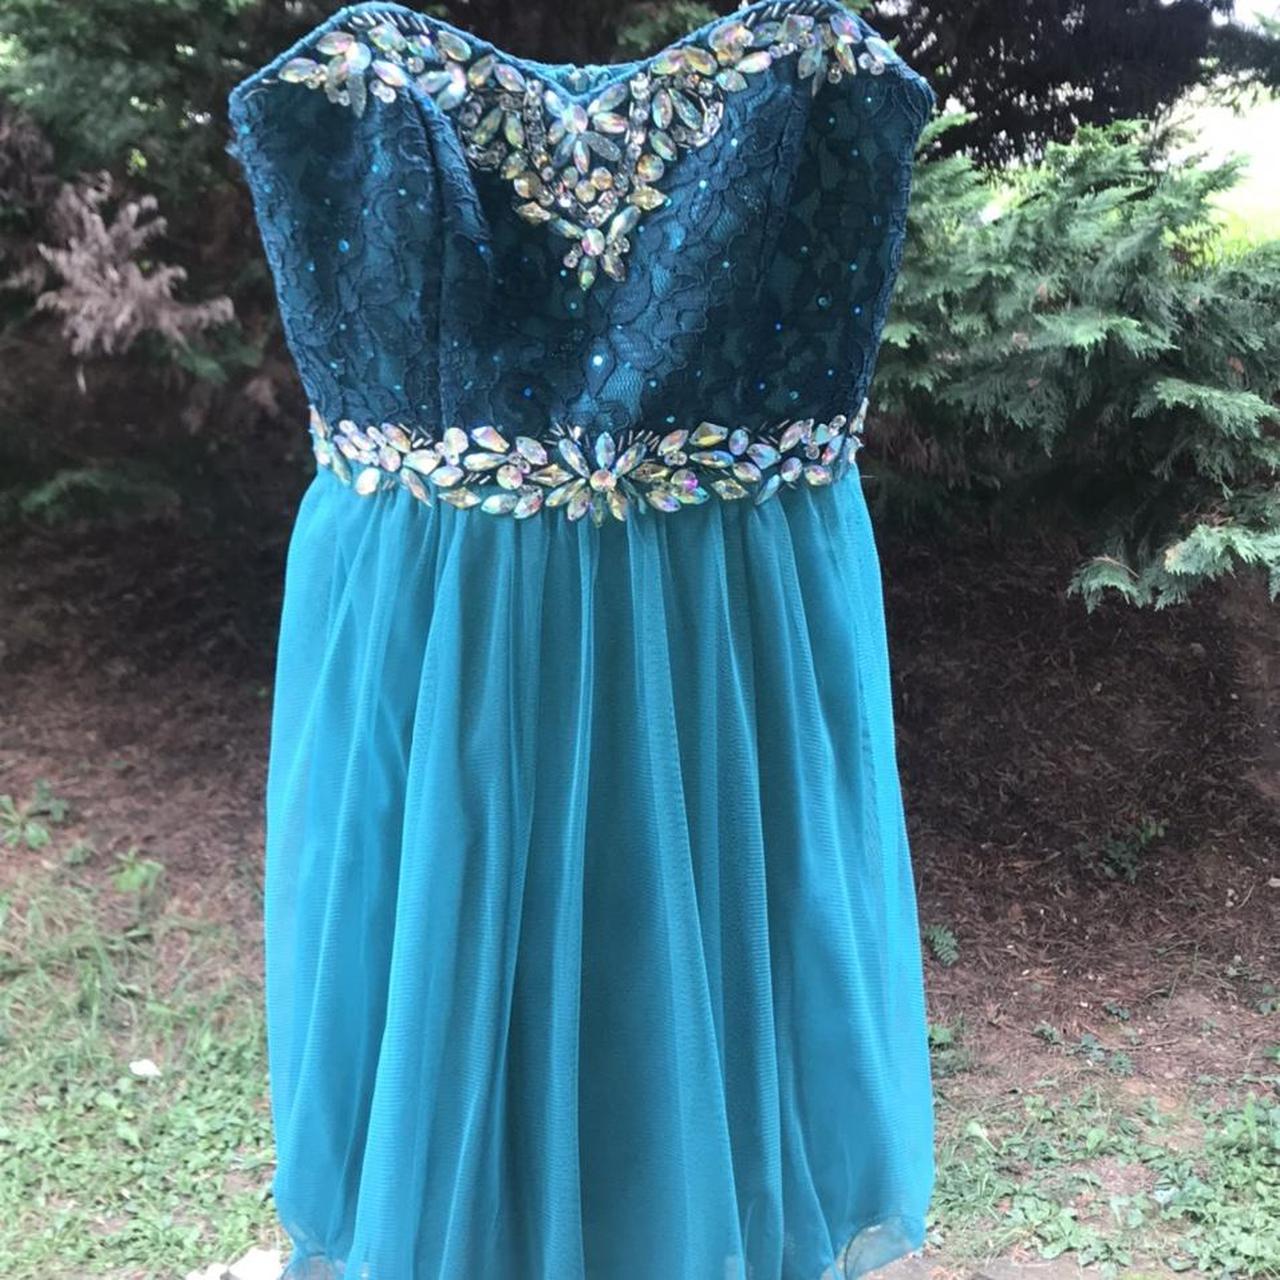 Product Image 1 - A fun, beautiful, blue dress